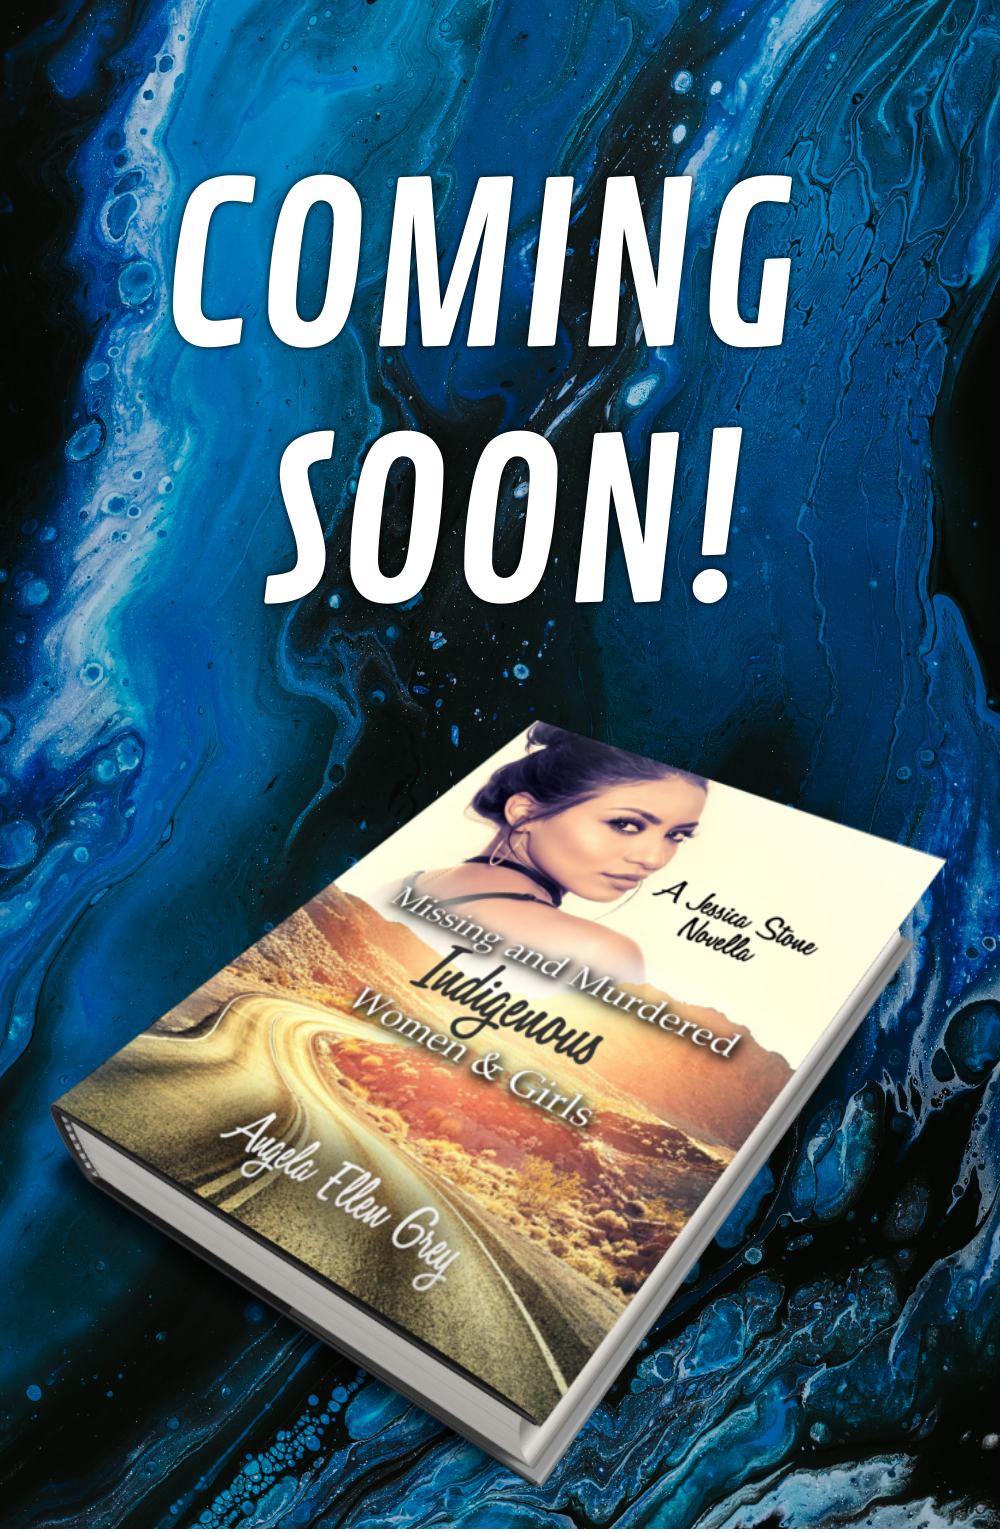 BookBrushImage-Coming Soon MMIWG